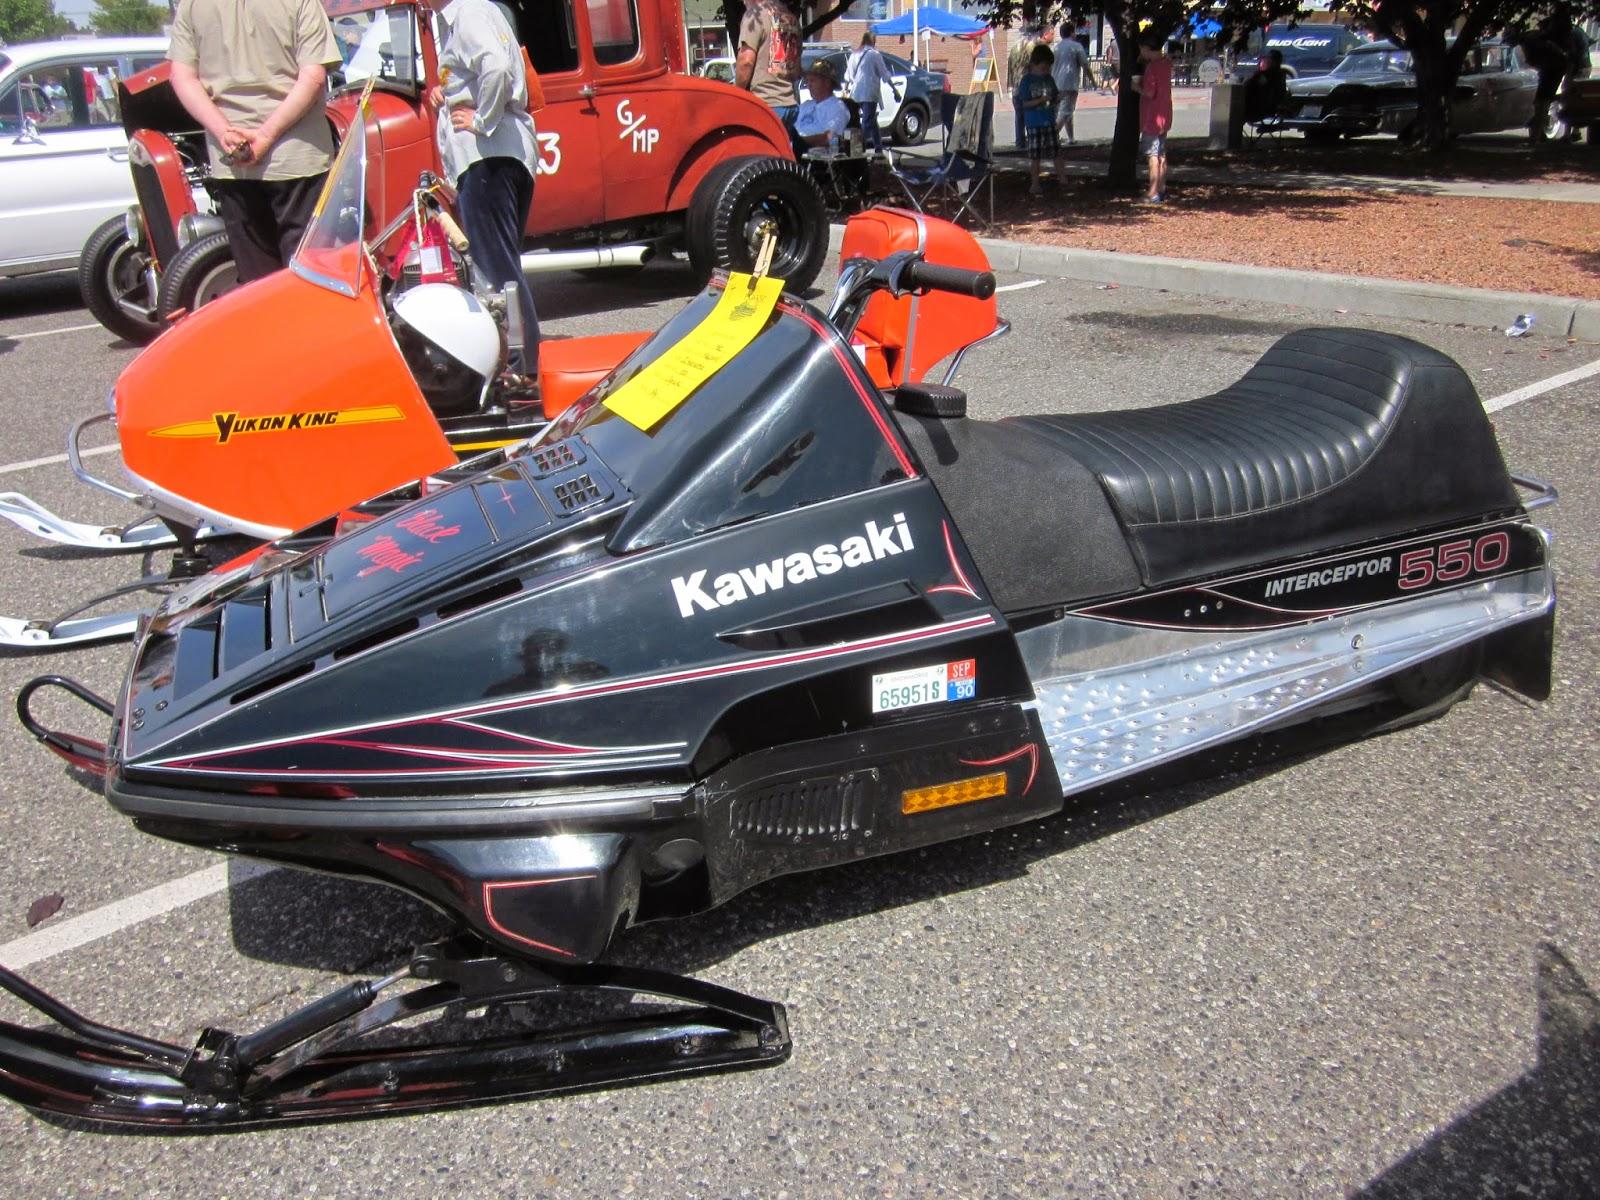 oldmotodude: 1982 kawasaki 550 interceptor snowmobile on display